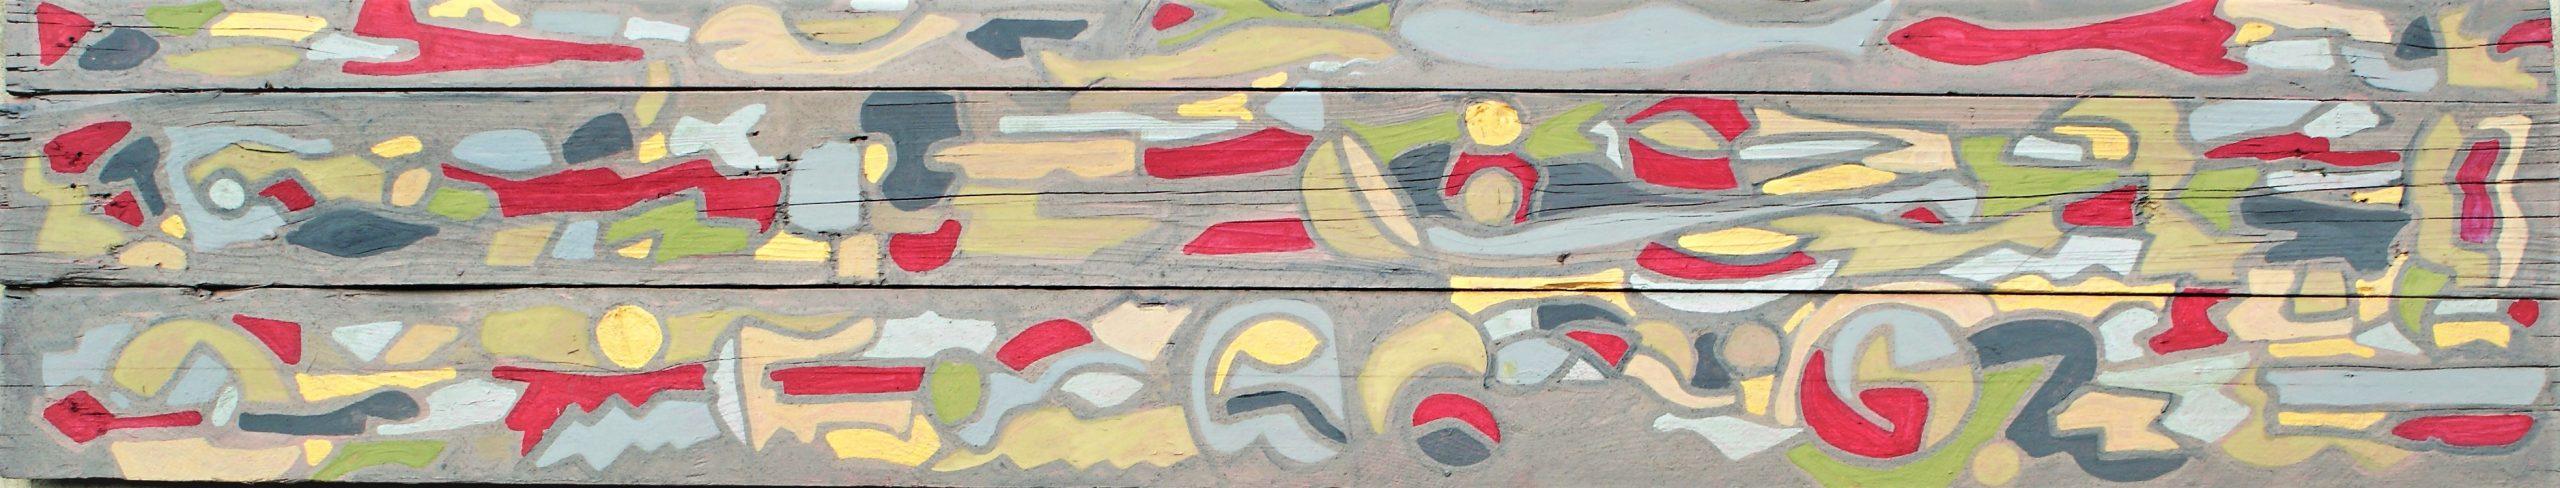 Maya - Legni di Mare, Acrylic 200/40 cm.